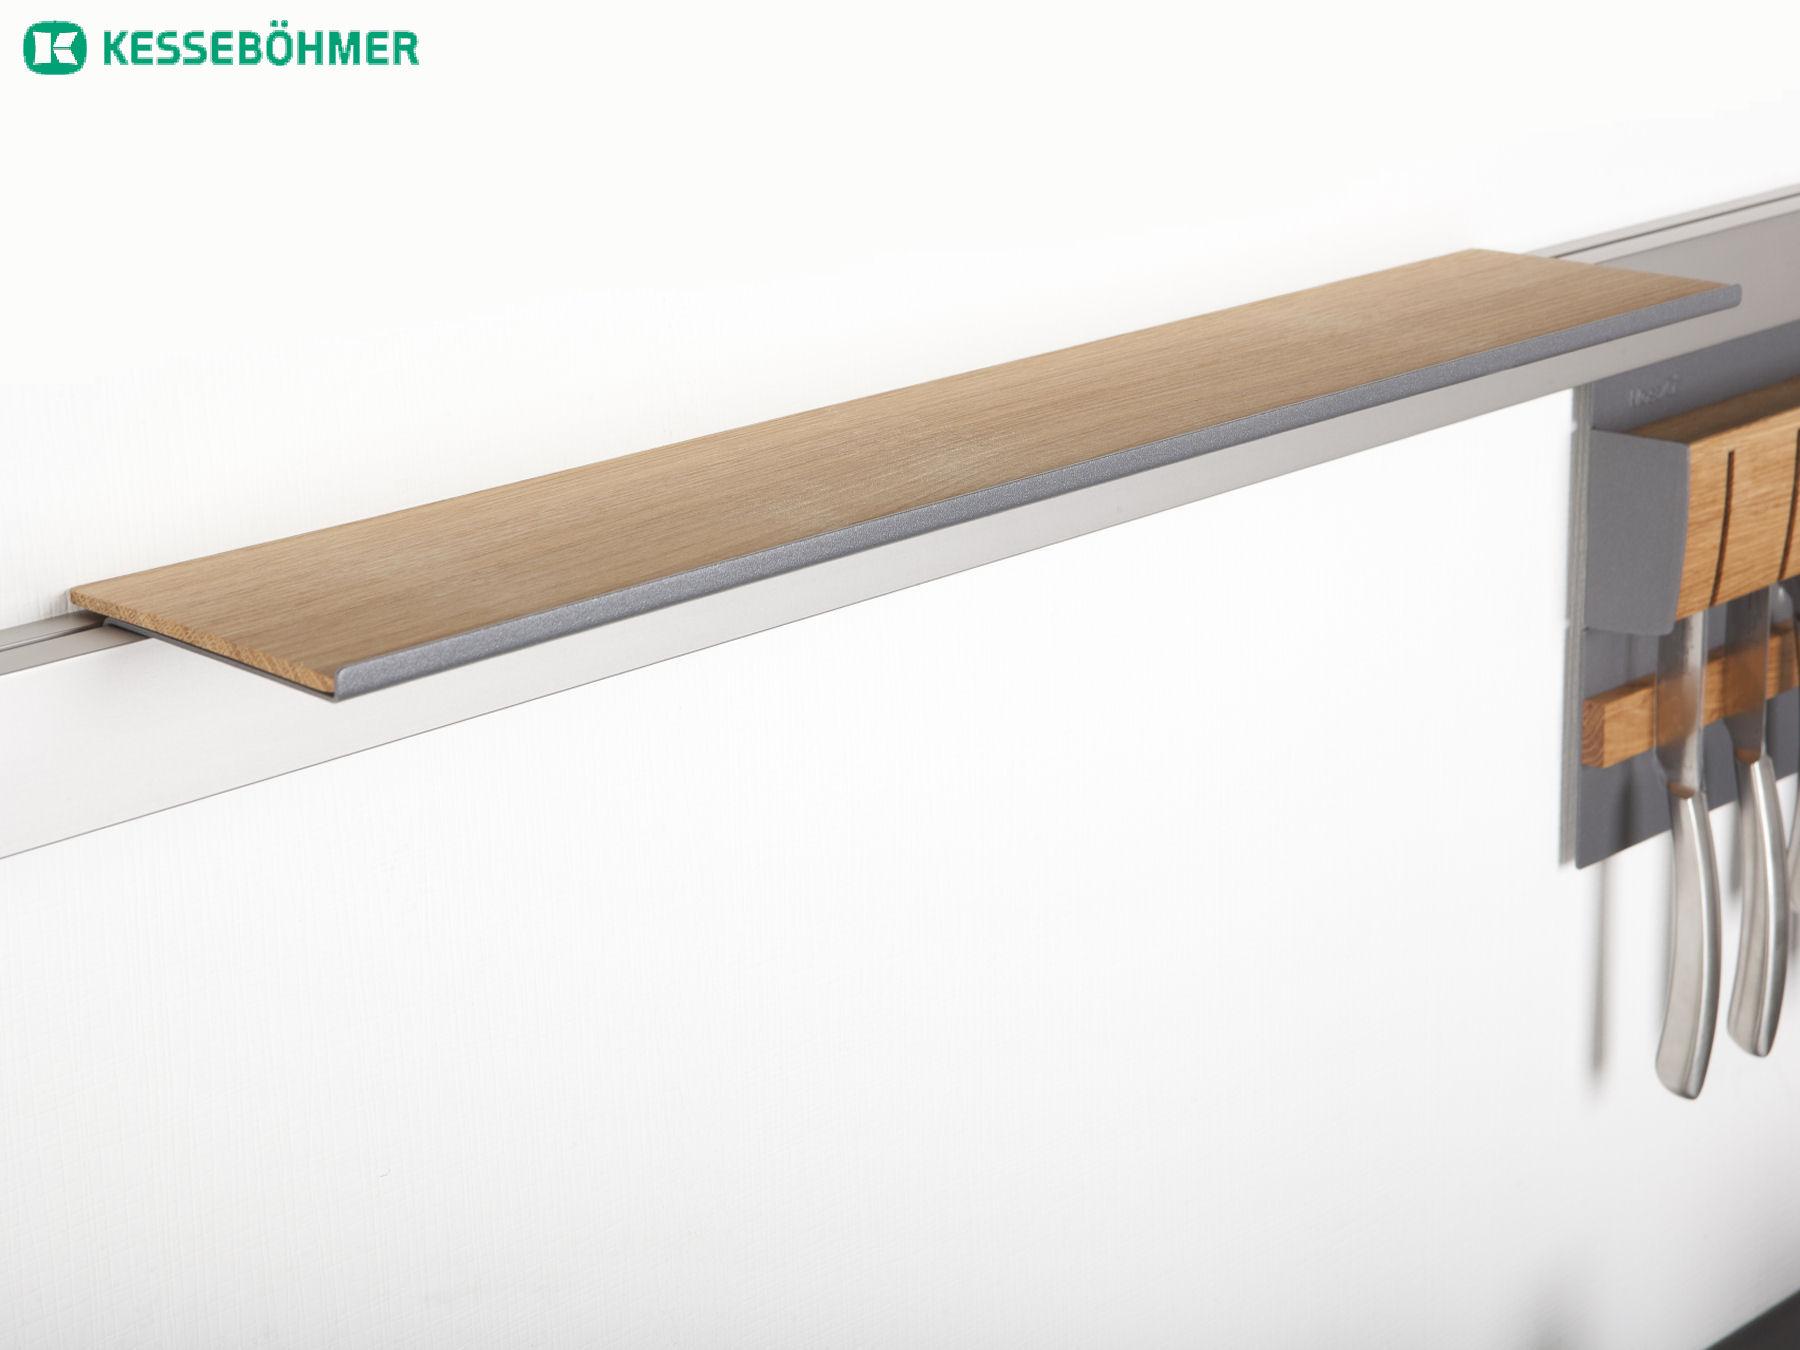 Relingsystem Kuche Holz Kreative Deko Ideen und